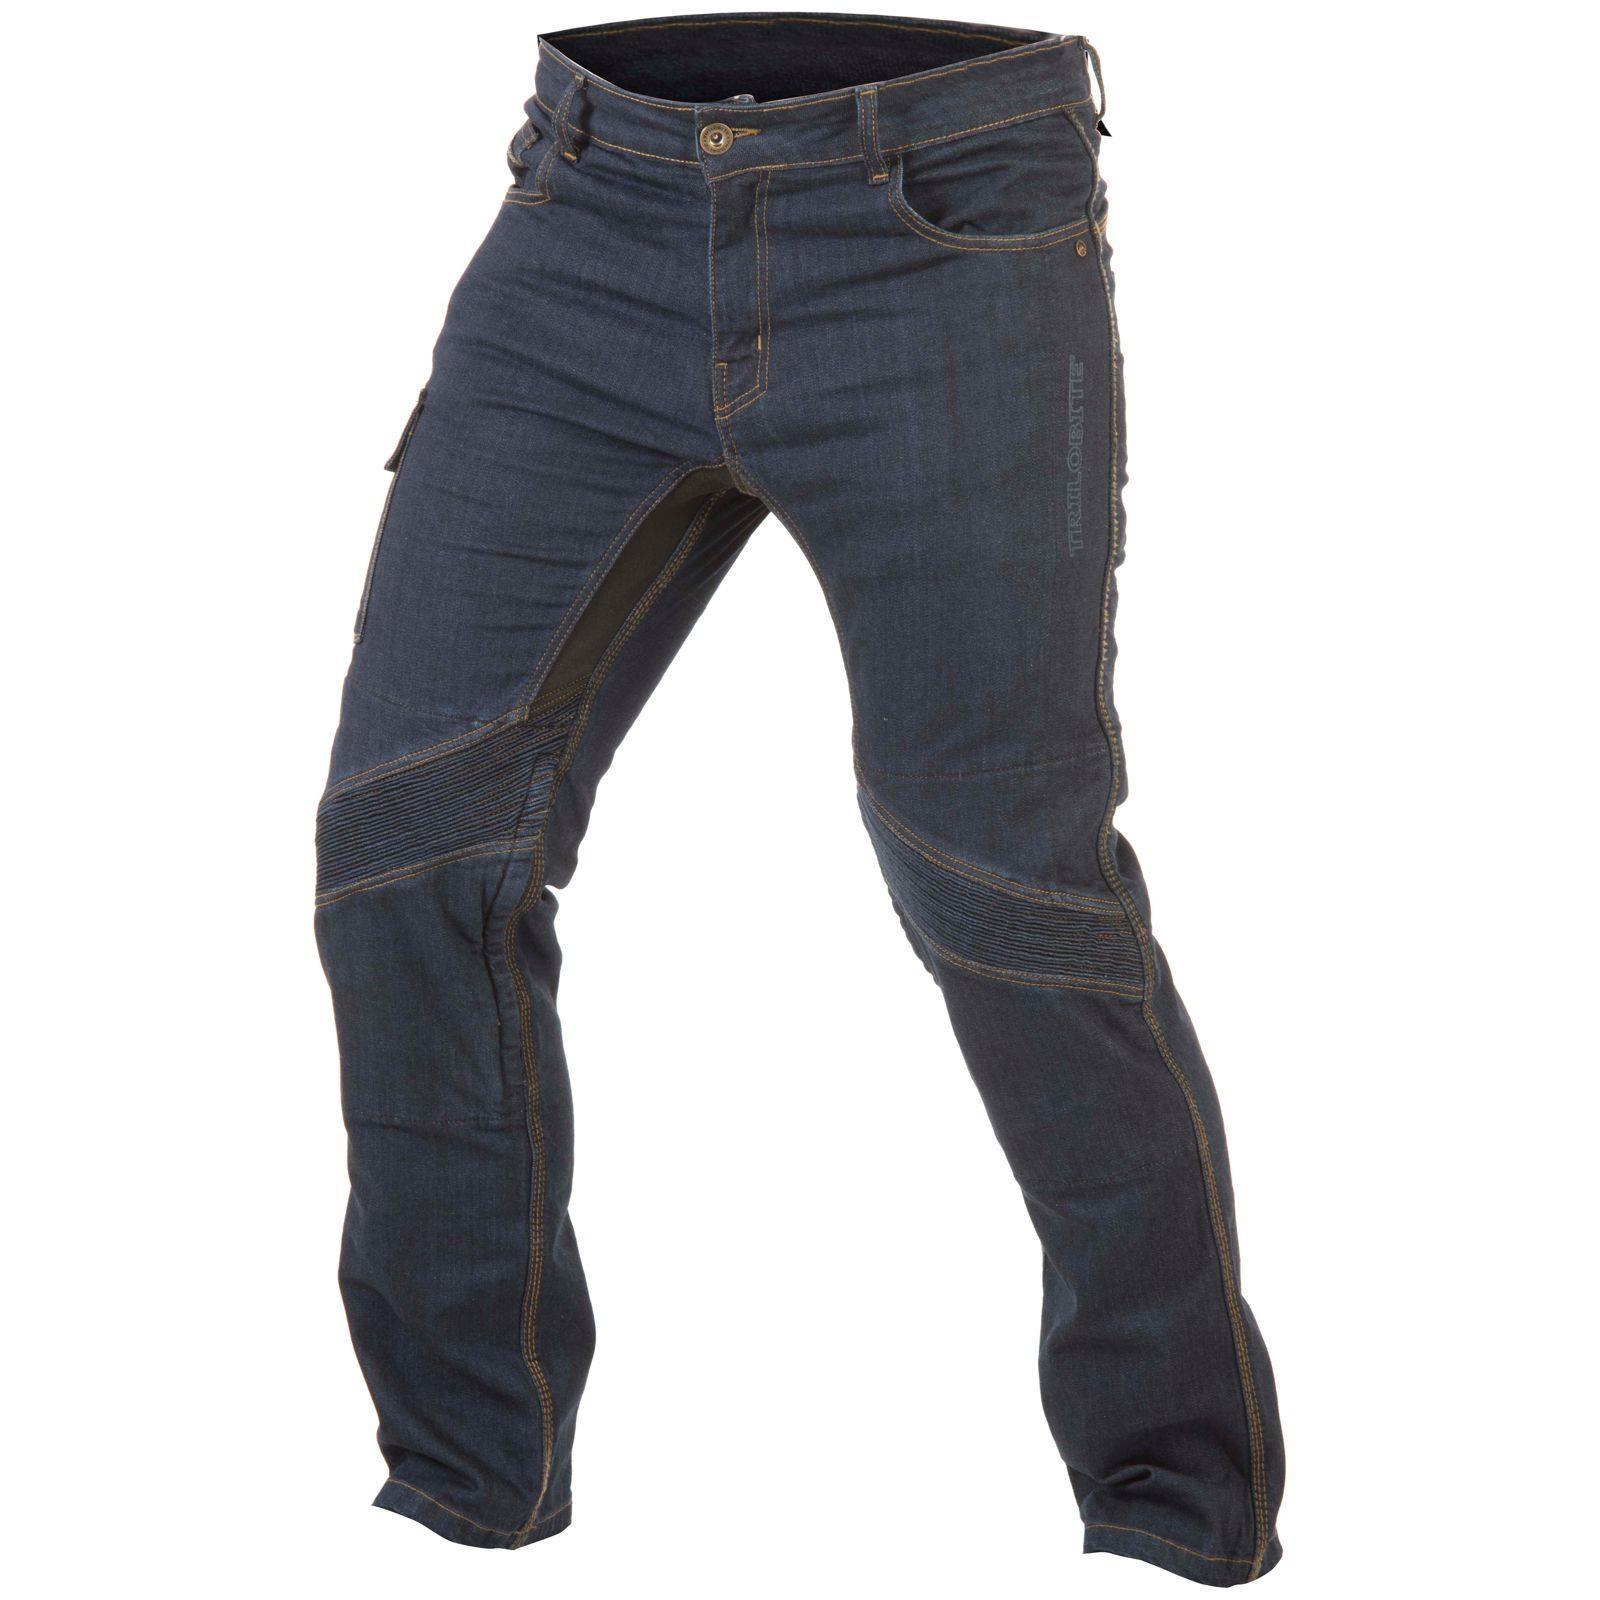 trilobite motorrad hose jeans bekleidung parado micas. Black Bedroom Furniture Sets. Home Design Ideas